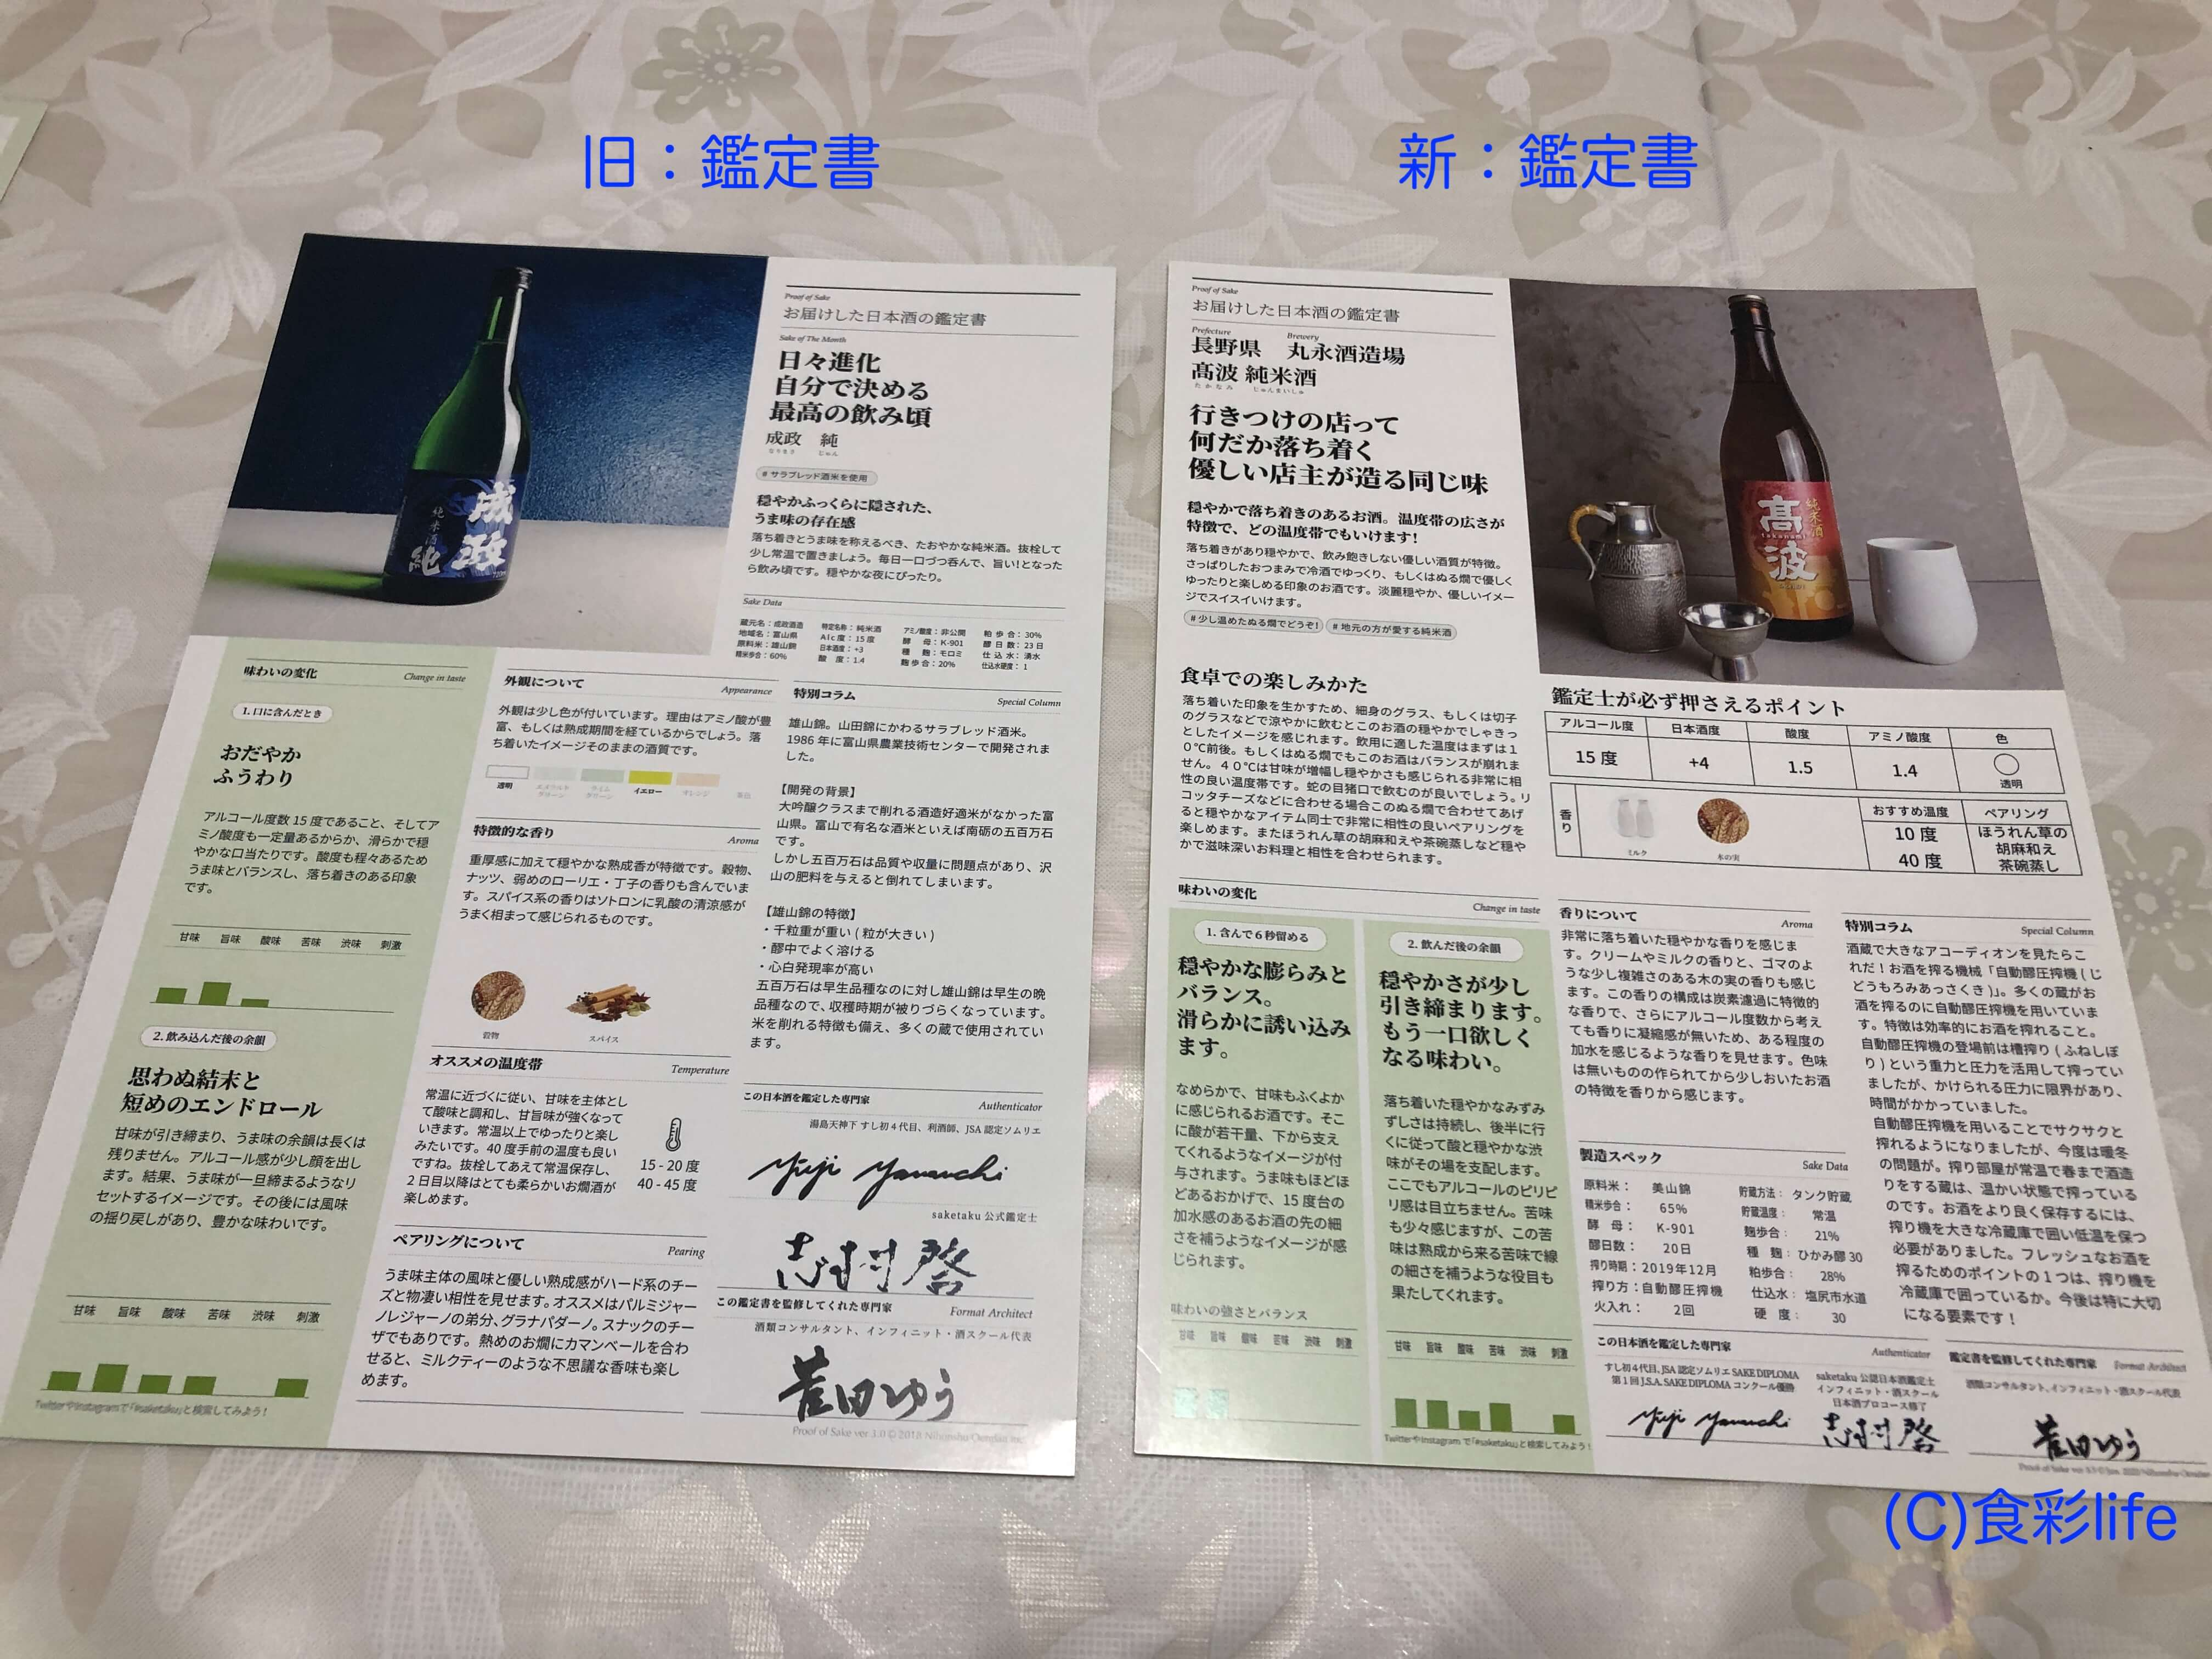 saketaku 鑑定書 旧・新比較